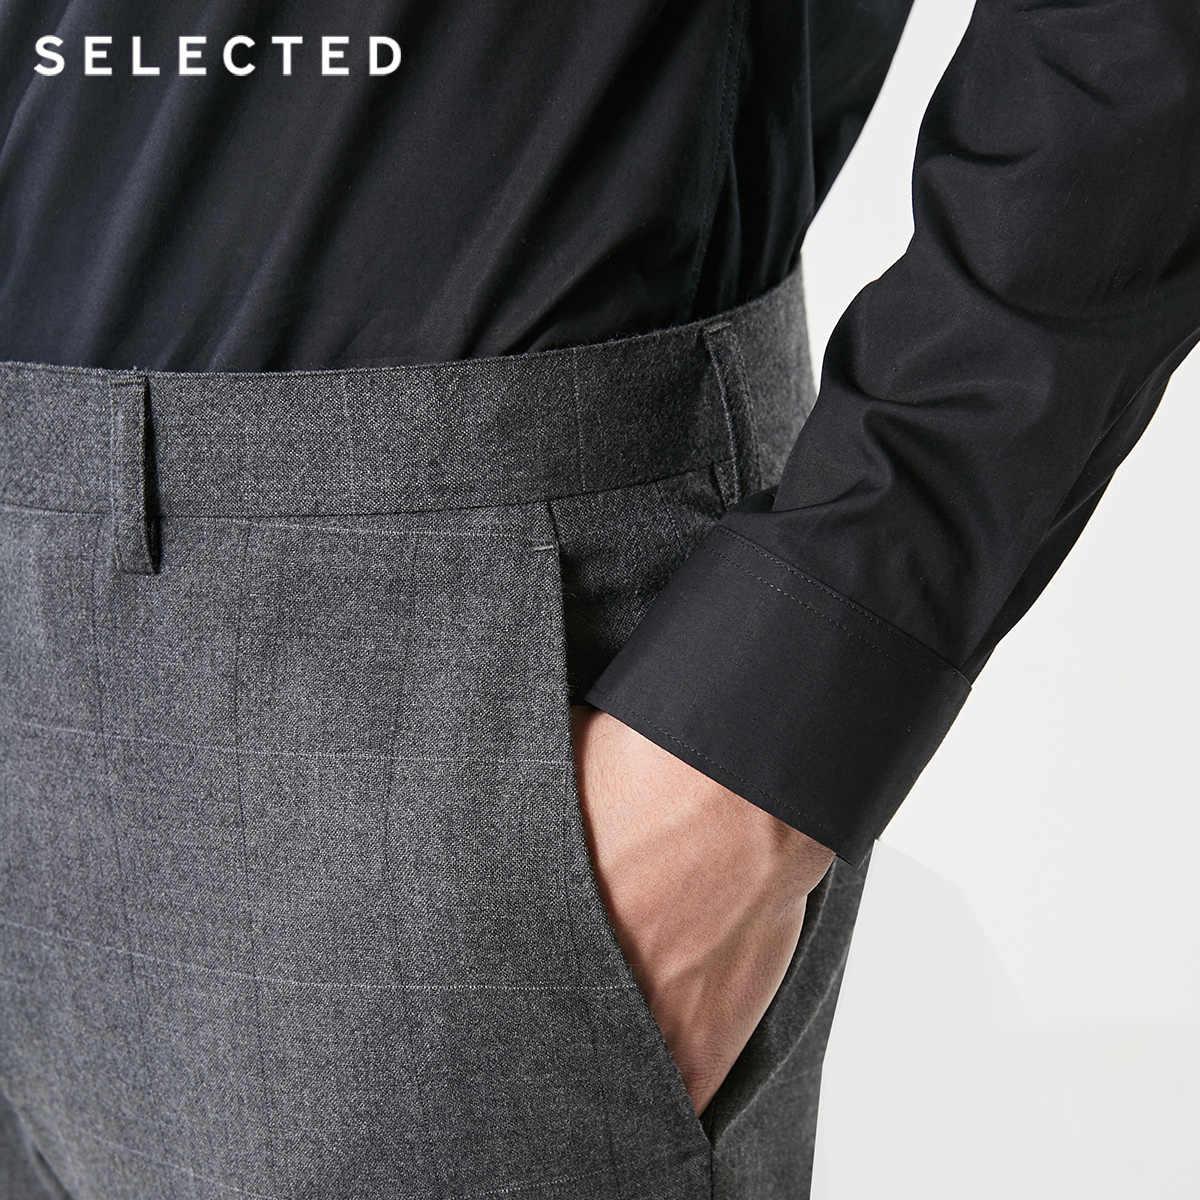 SELECTED 남성 100% 모직 체크 무늬 슬림 피트 정장 바지 T | 41916C504